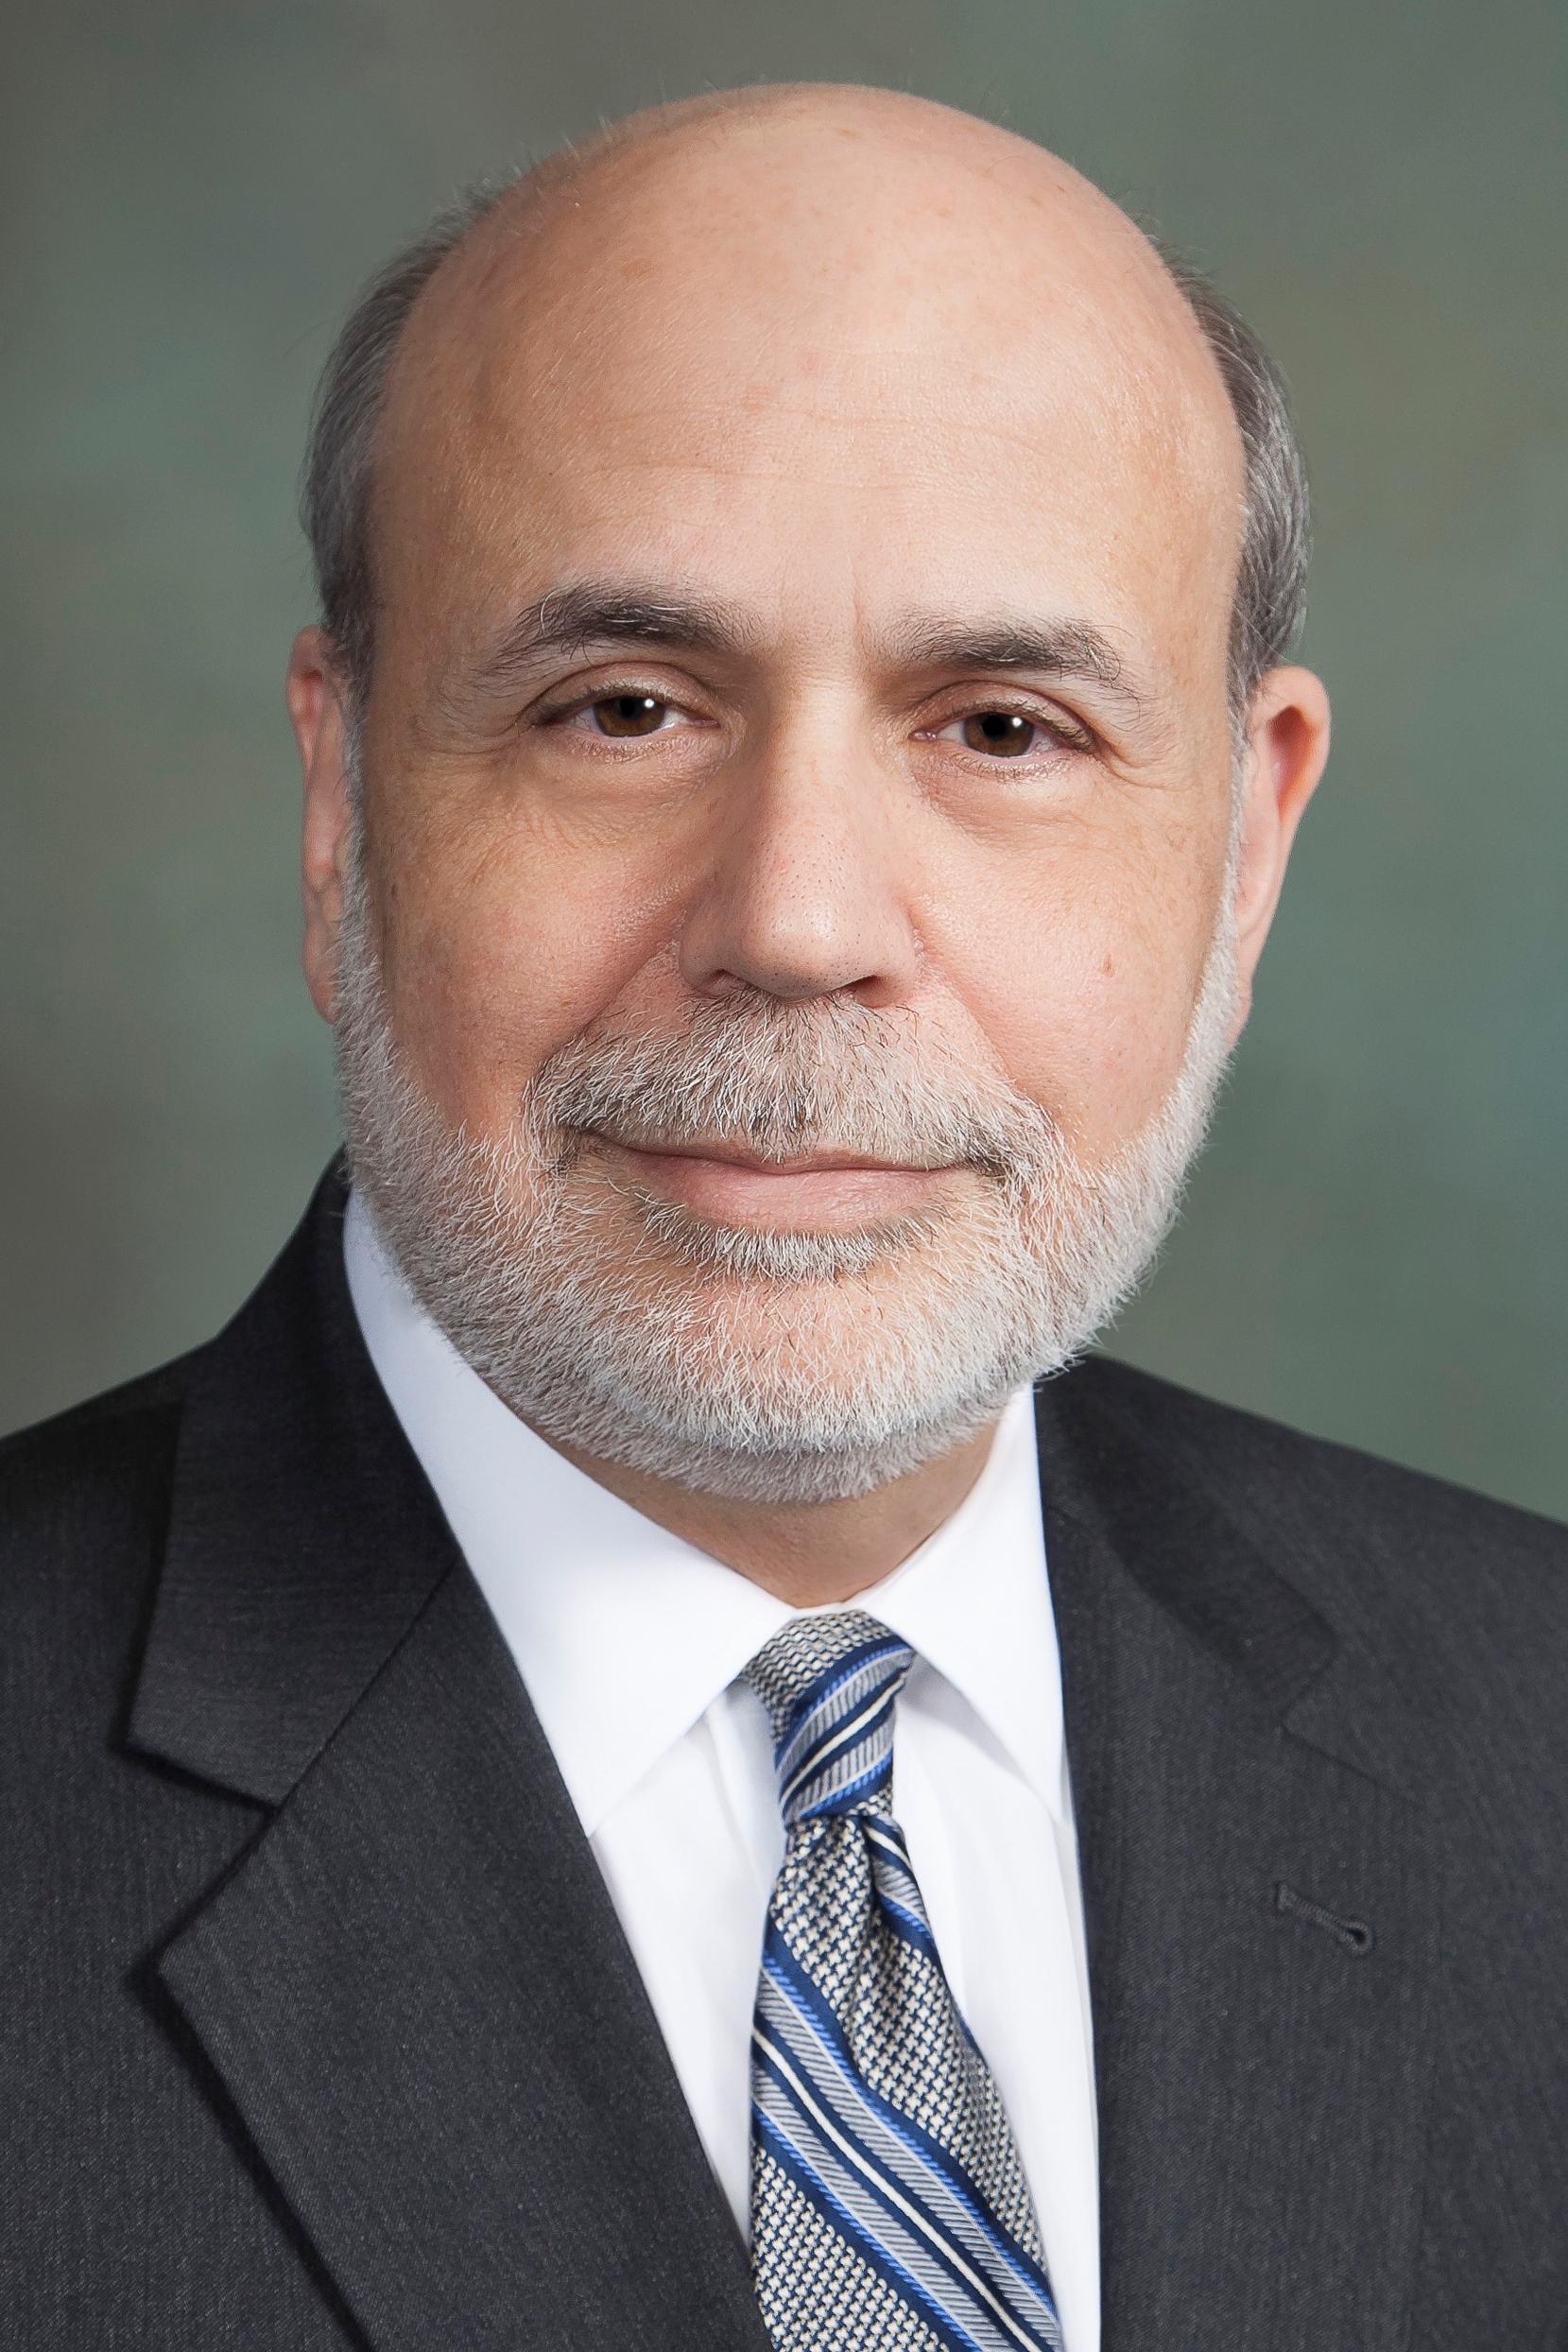 Ben Bernanke to speak at 2014 World Business Forum, Oct. 7-8, NYC. wobi.com/wbf-nyc (Photo: Business Wire)